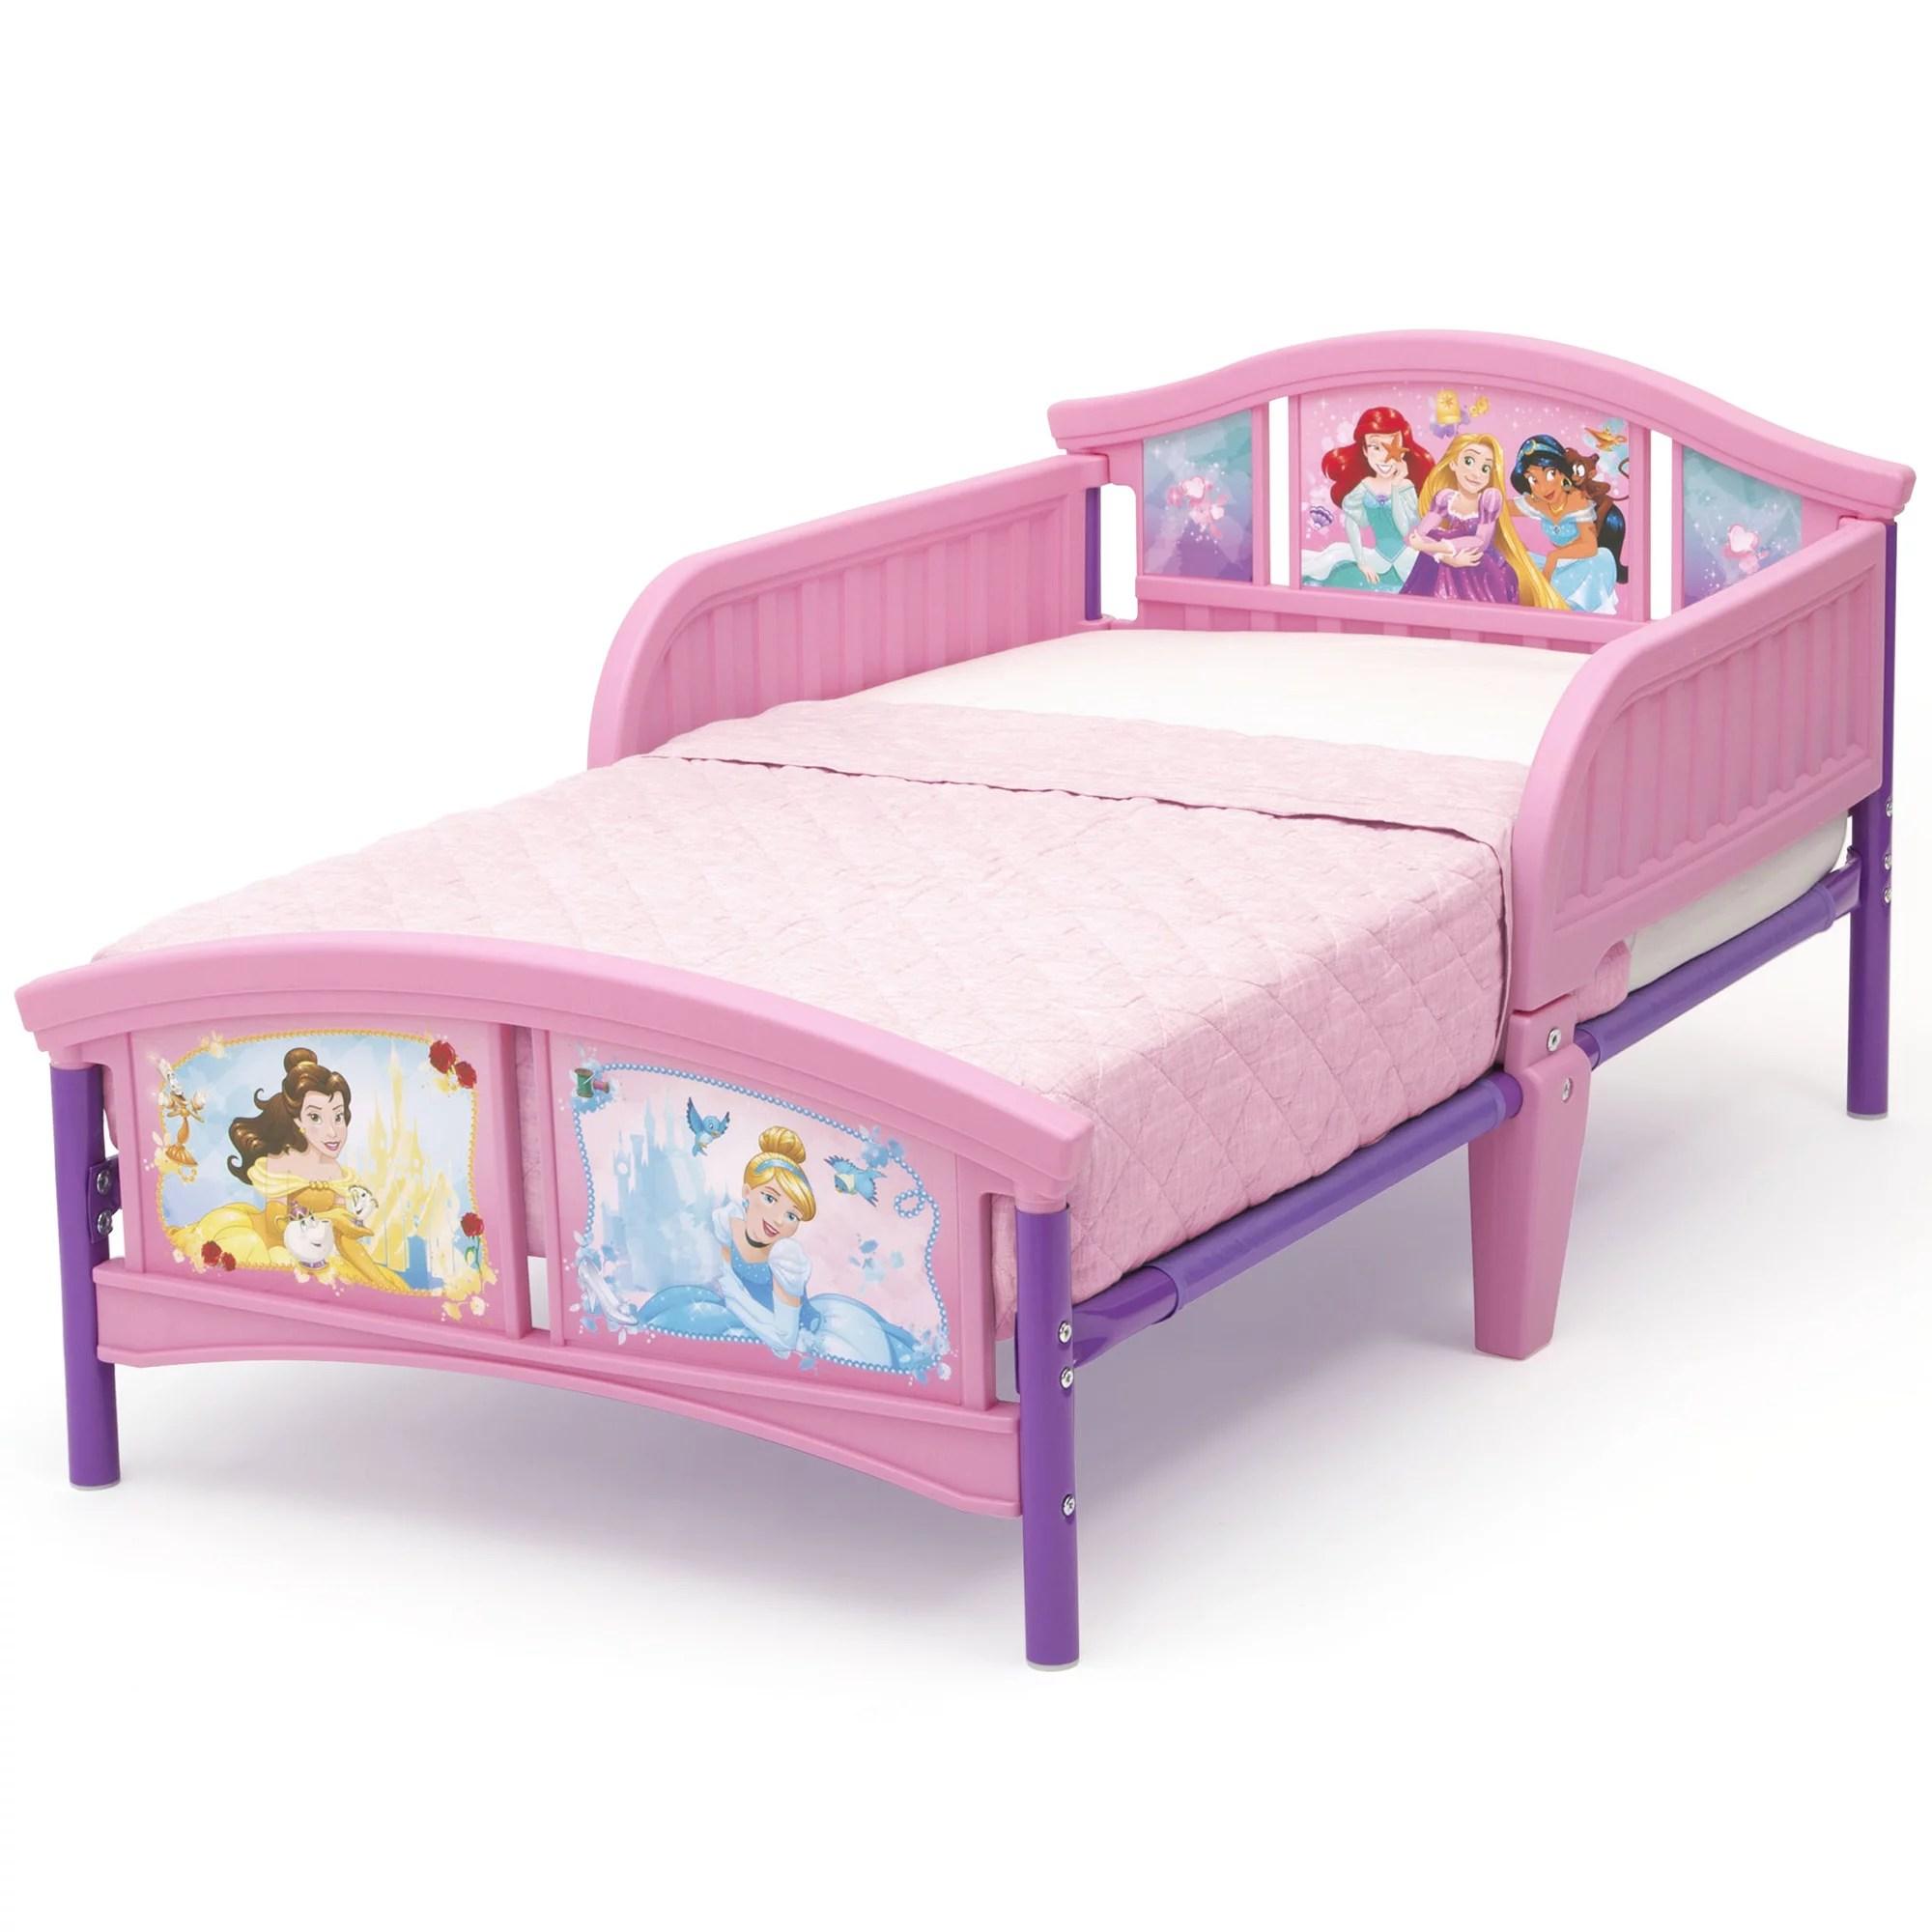 disney princess plastic toddler bed by delta children forever princess mattress not included walmart com